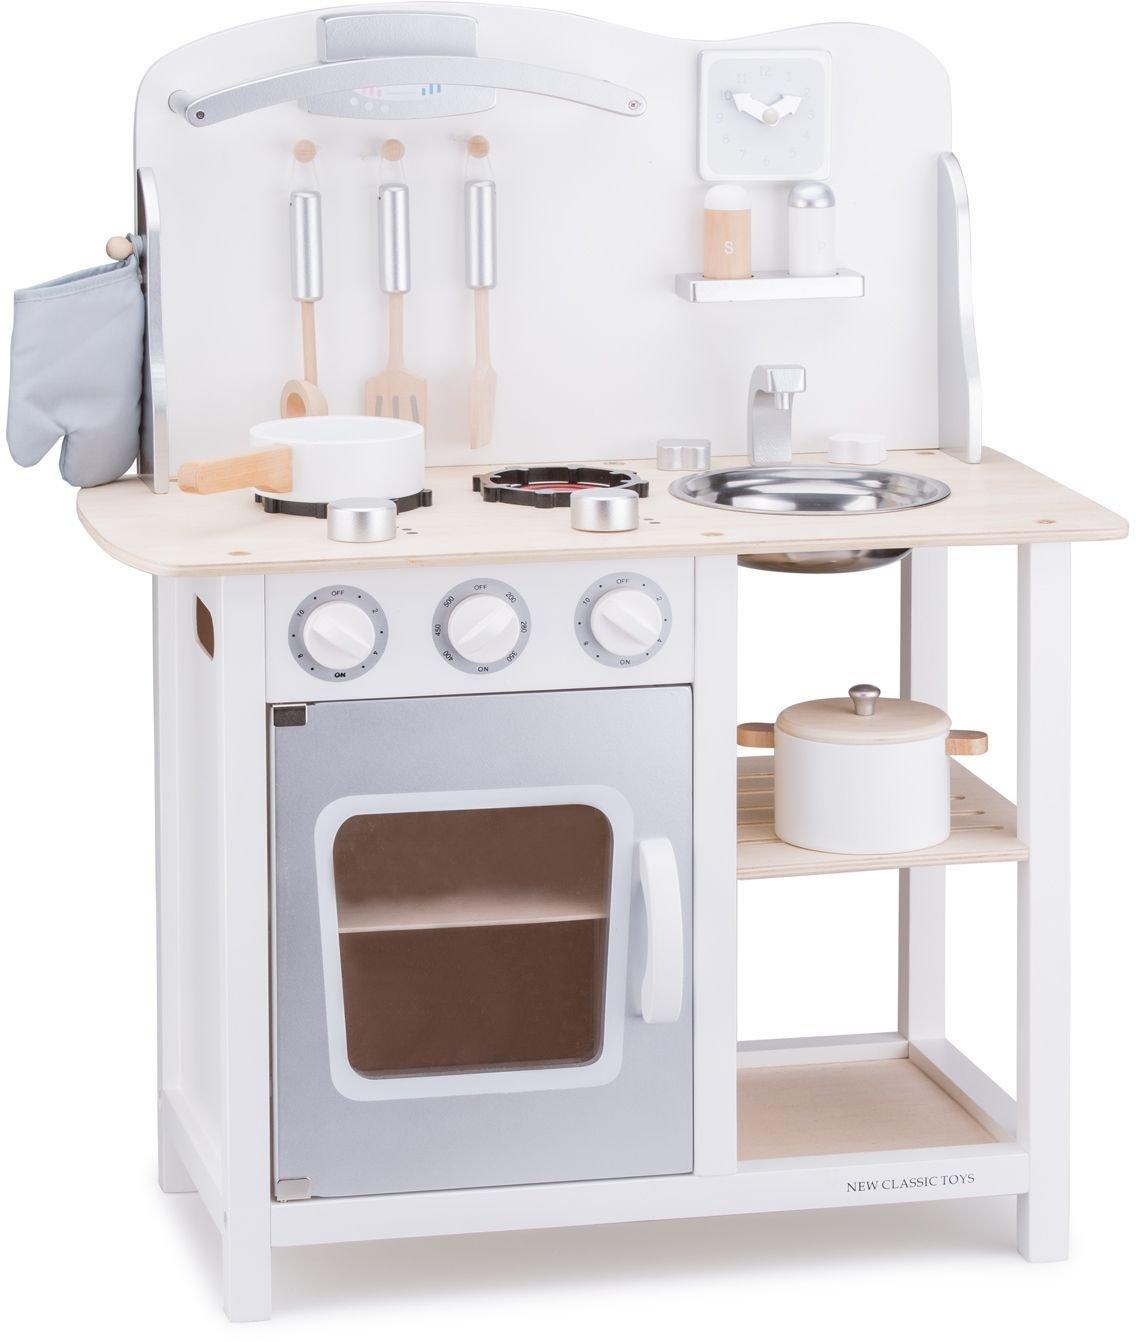 Kinderküche Grau - New Classic Toys Kinderküche weiß silber